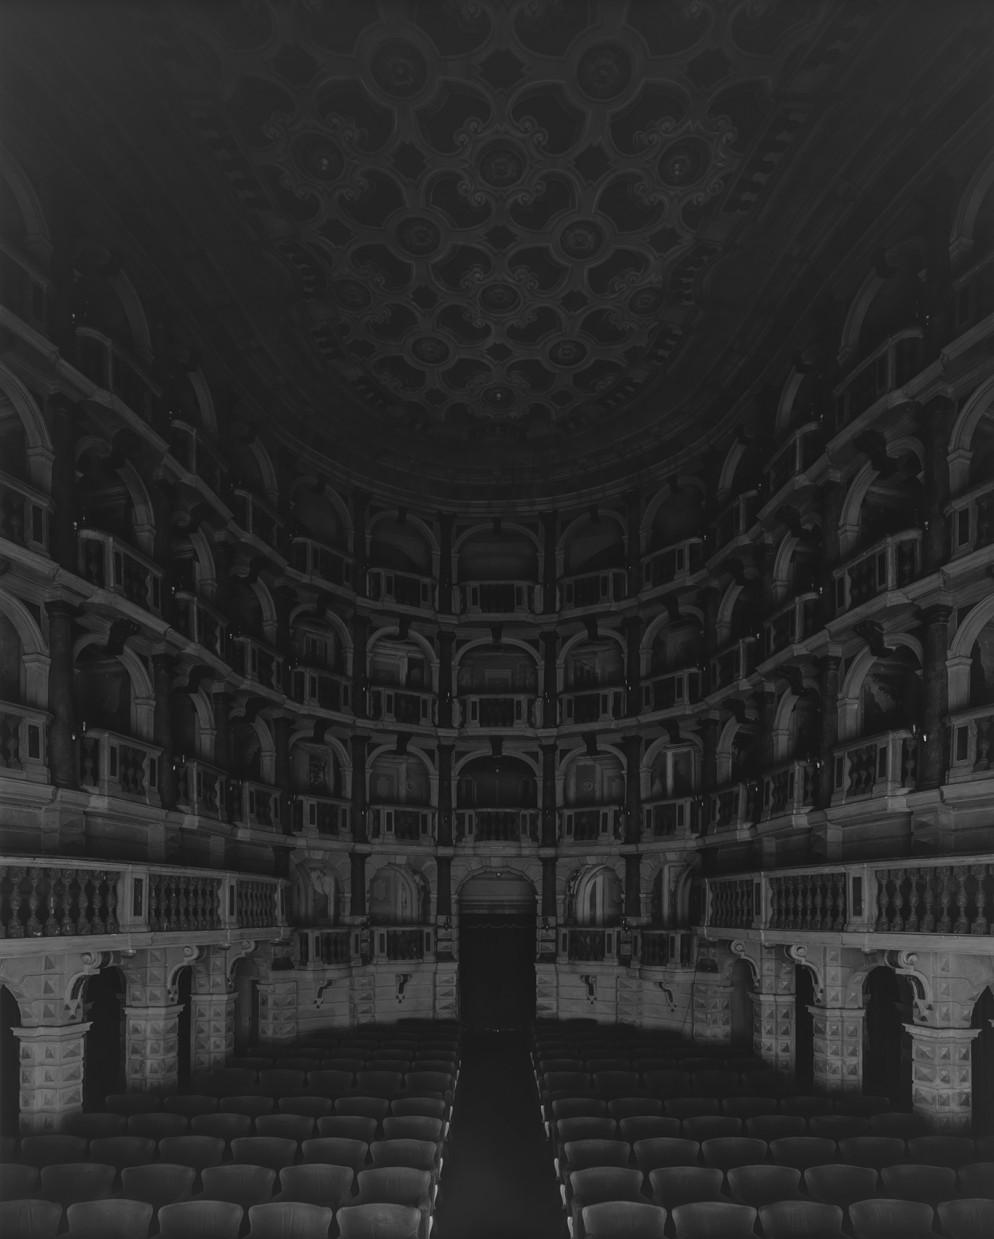 34.006_Teatro Scientifico del Bibiena, Mantova, 2015, I Vitelloni (Seating side)